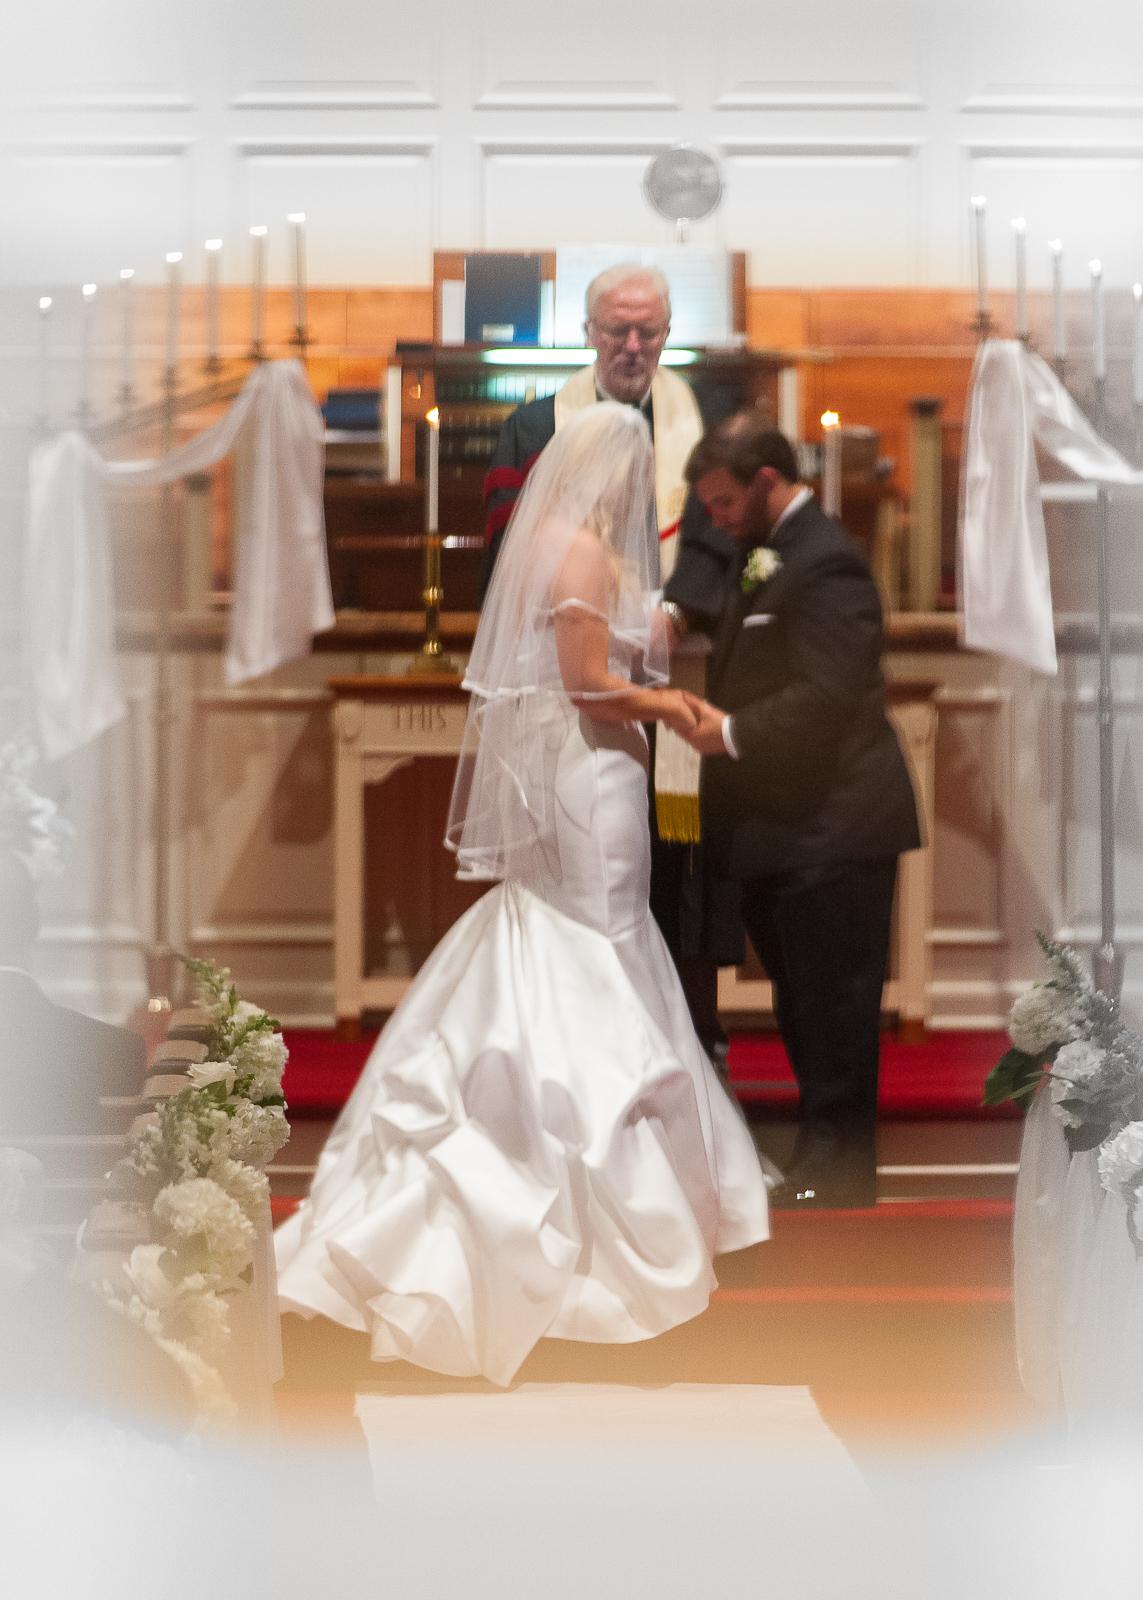 Michael-Napier-Weddings-Cogill-Bizzle-Album-2 (32).jpg